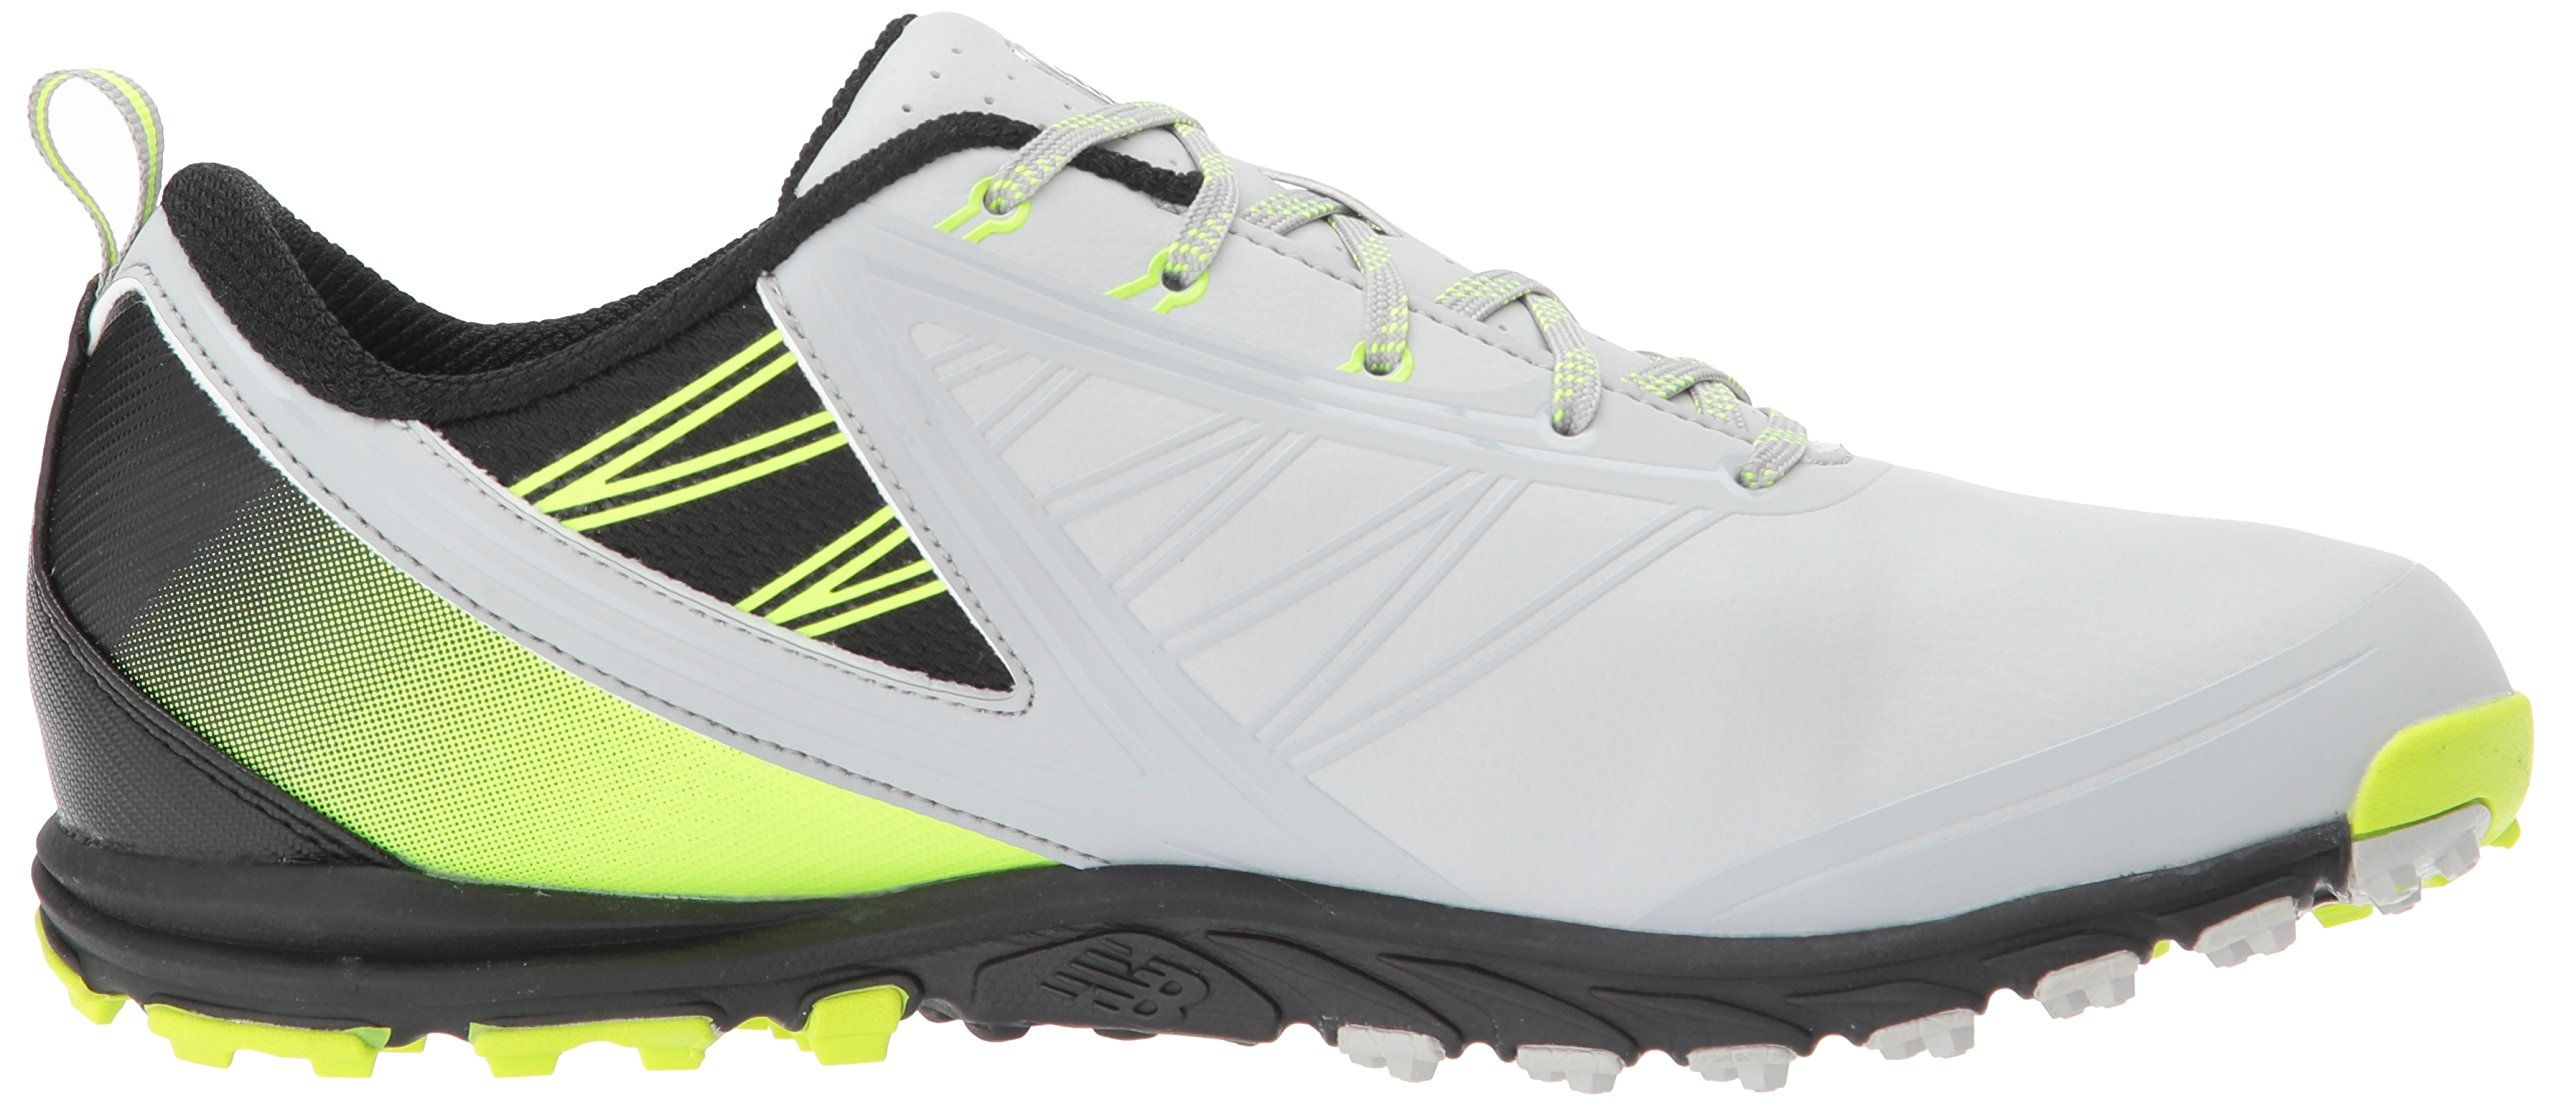 dfa6a985 Golf Shoes *** New Balance Mens Minimus SL Golf Shoe Grey/Green 10.5 ...